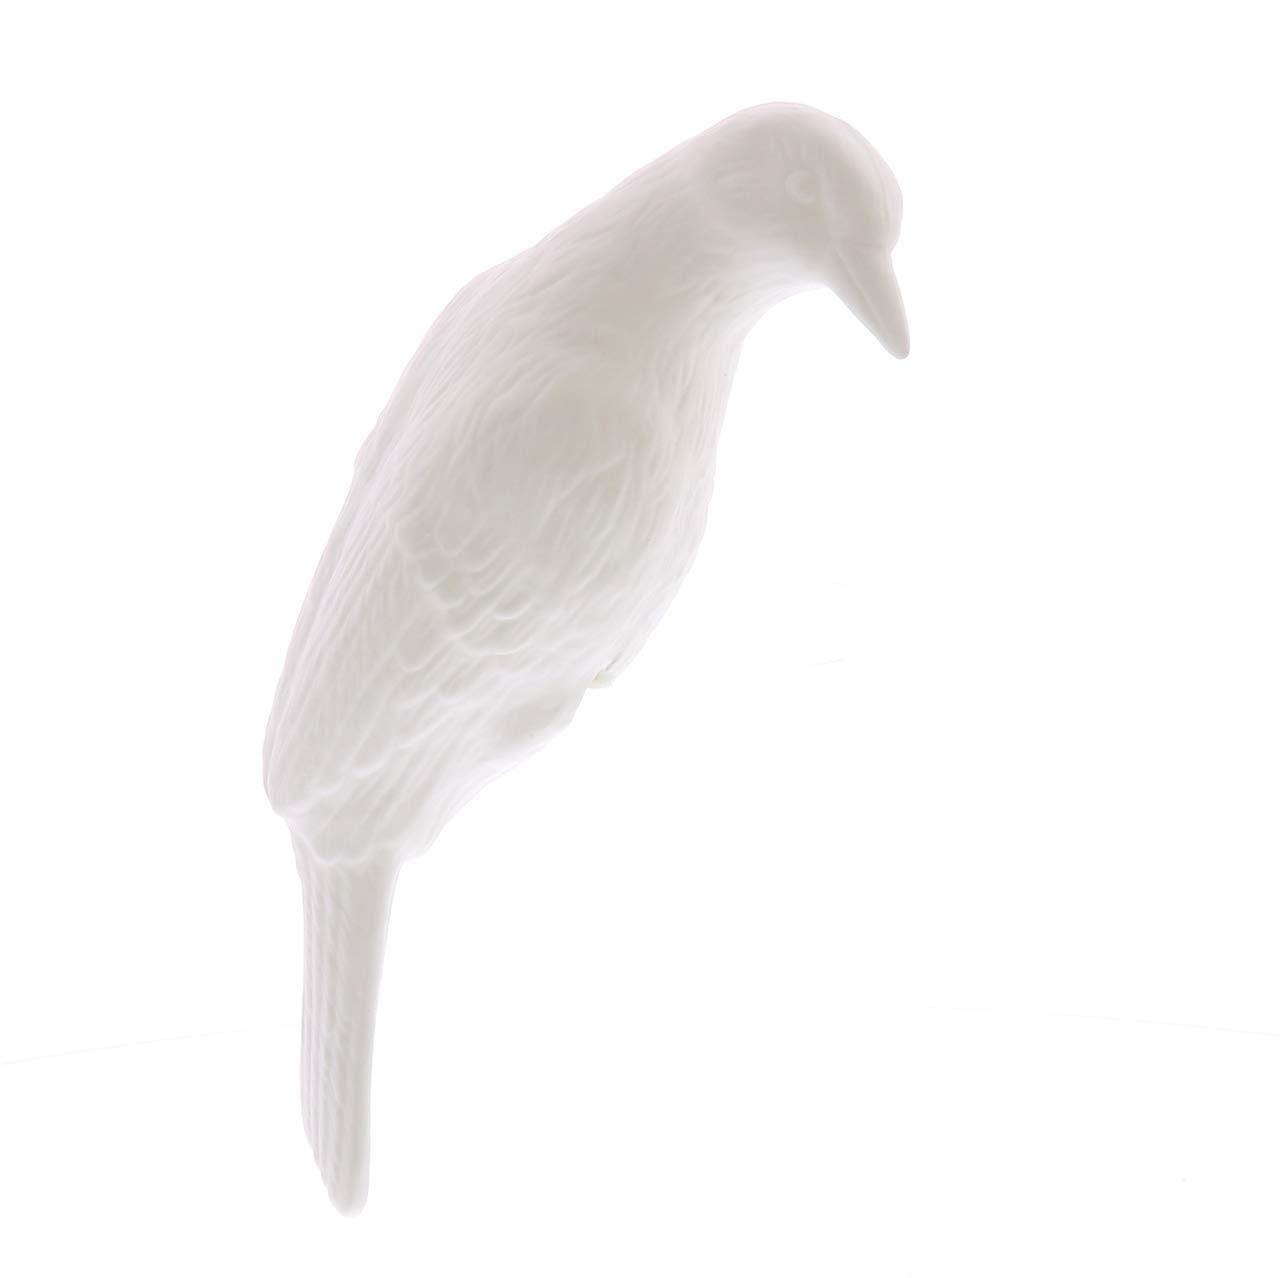 My Swanky Home Elegant White China Bird Figurine Vase Edge Sitter Perching Decorative